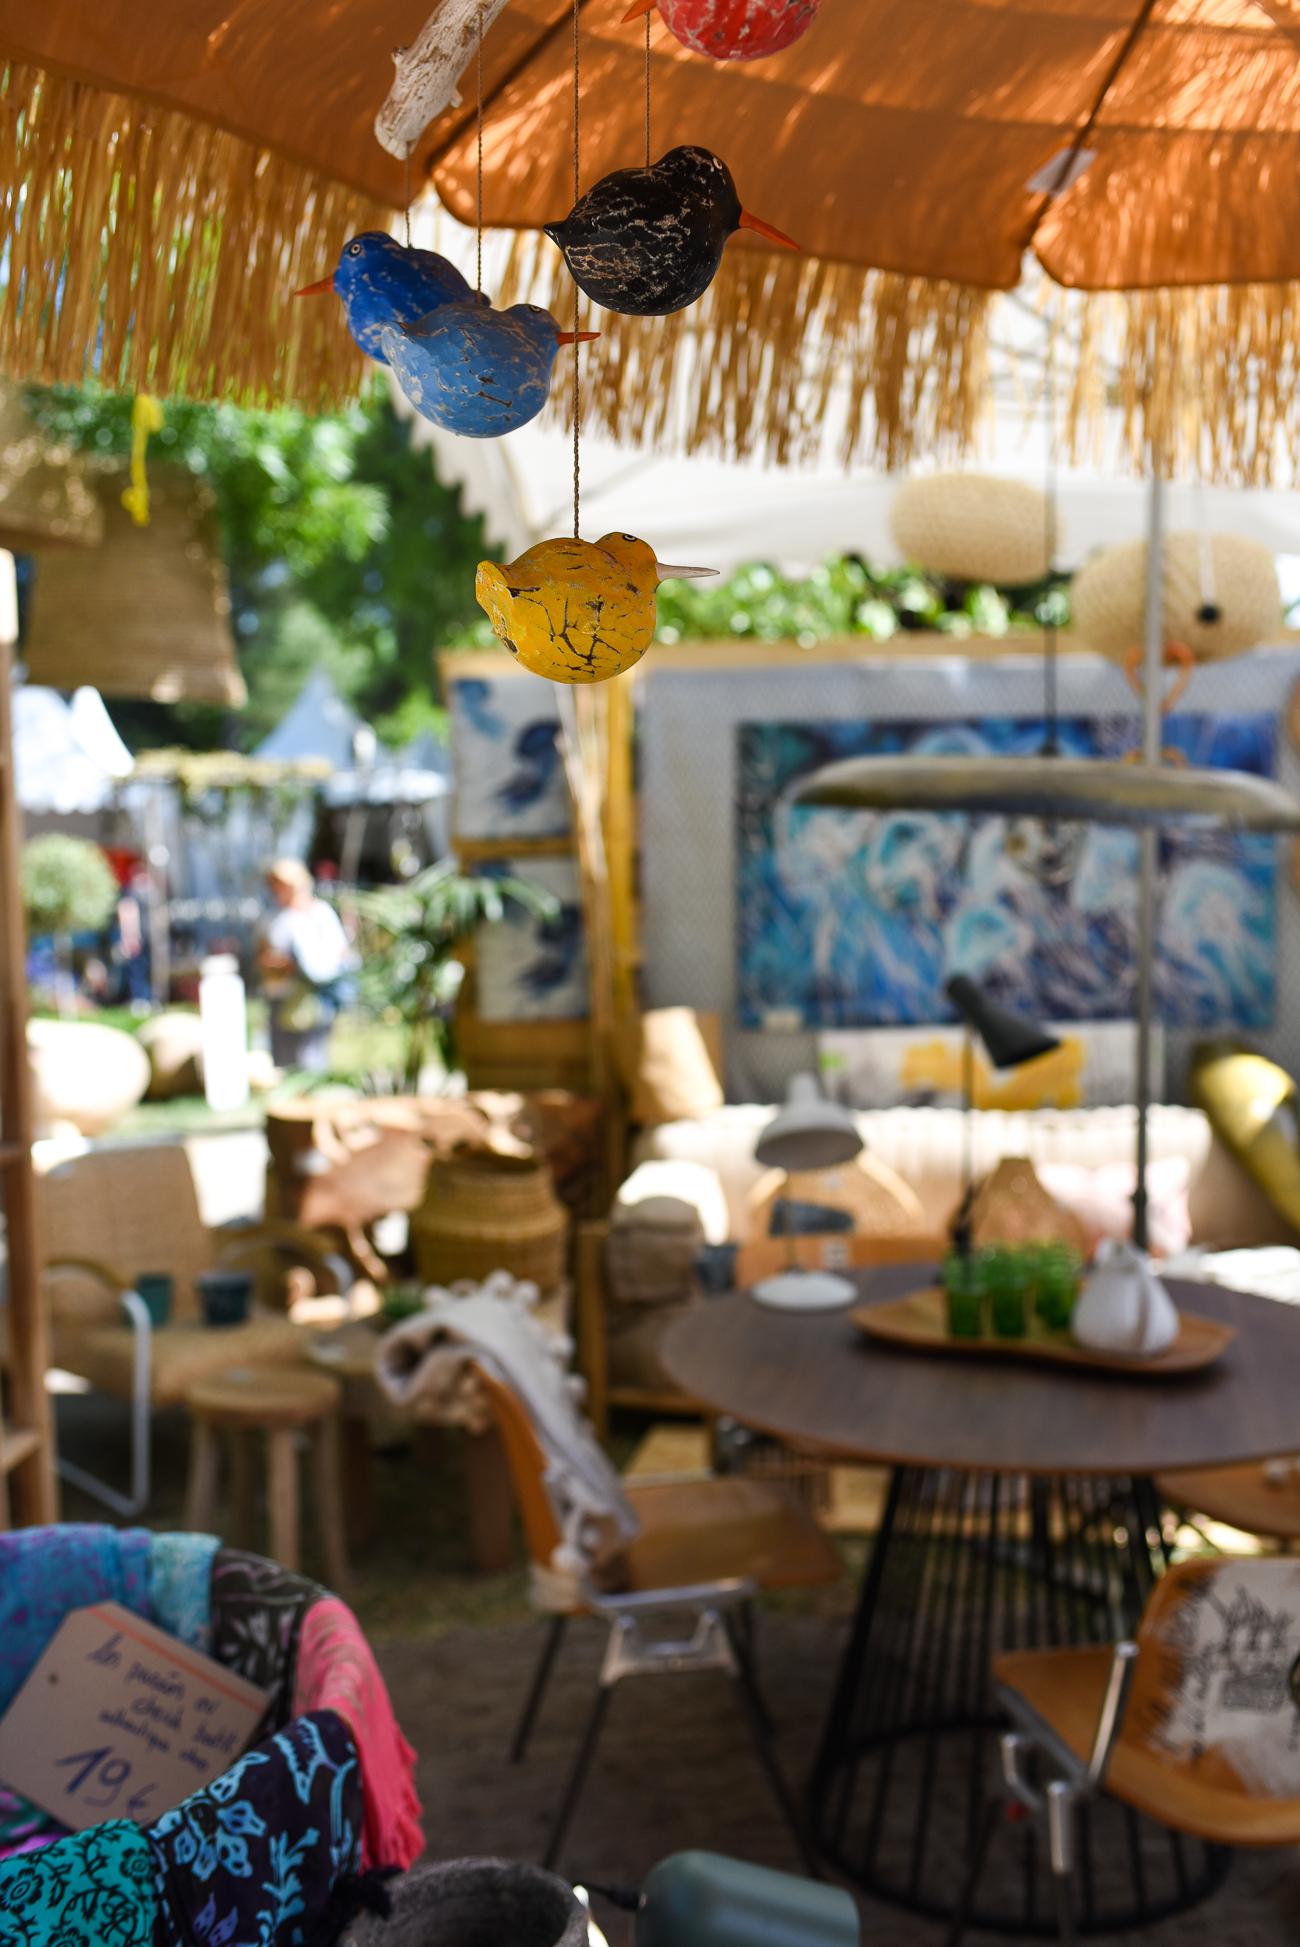 le-studio-twinky-photographe-salon-vivre-cote-sud-2019-aix-en-provence-13.jpg